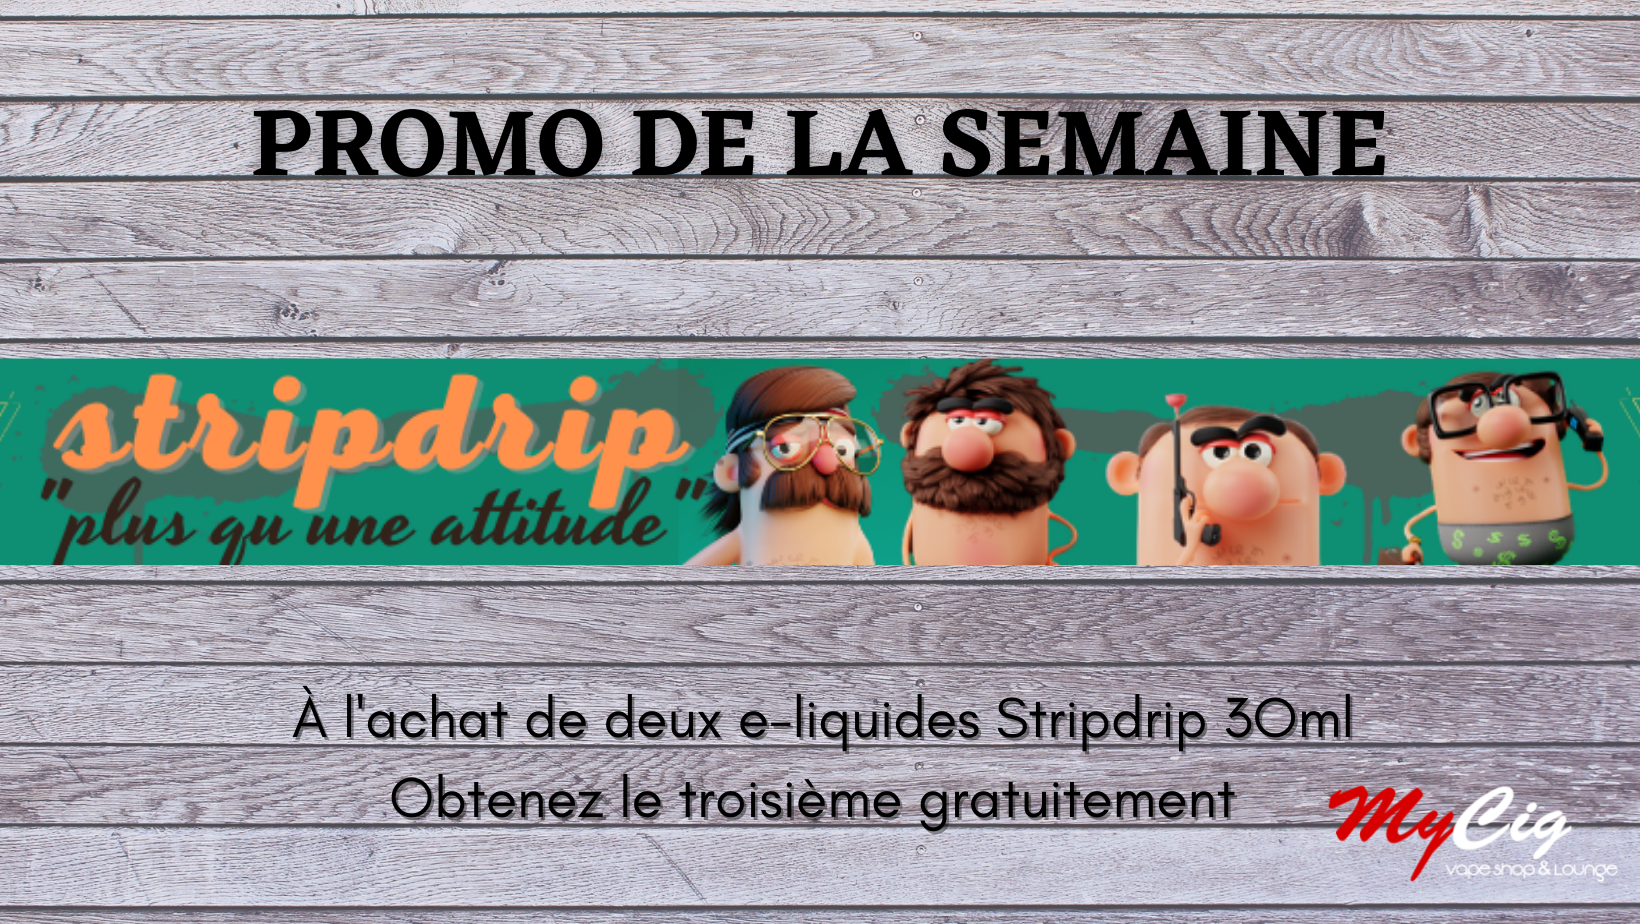 Promo Stripdrip MyCig Maroc